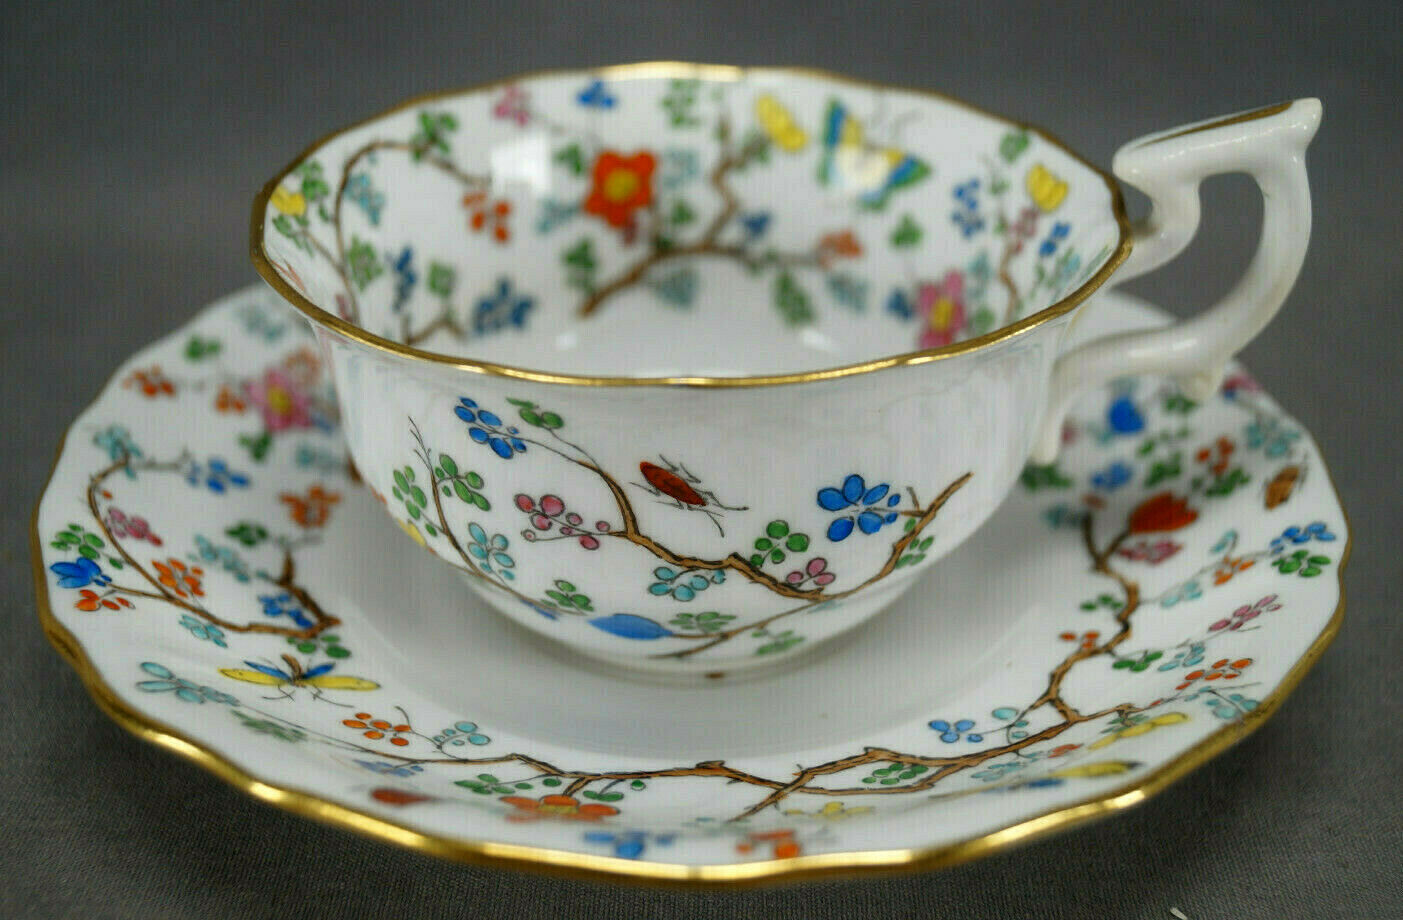 Spode Copeland Shanghai Pattern Hand Colored Bone China Tea Cup & Saucer C.1891+